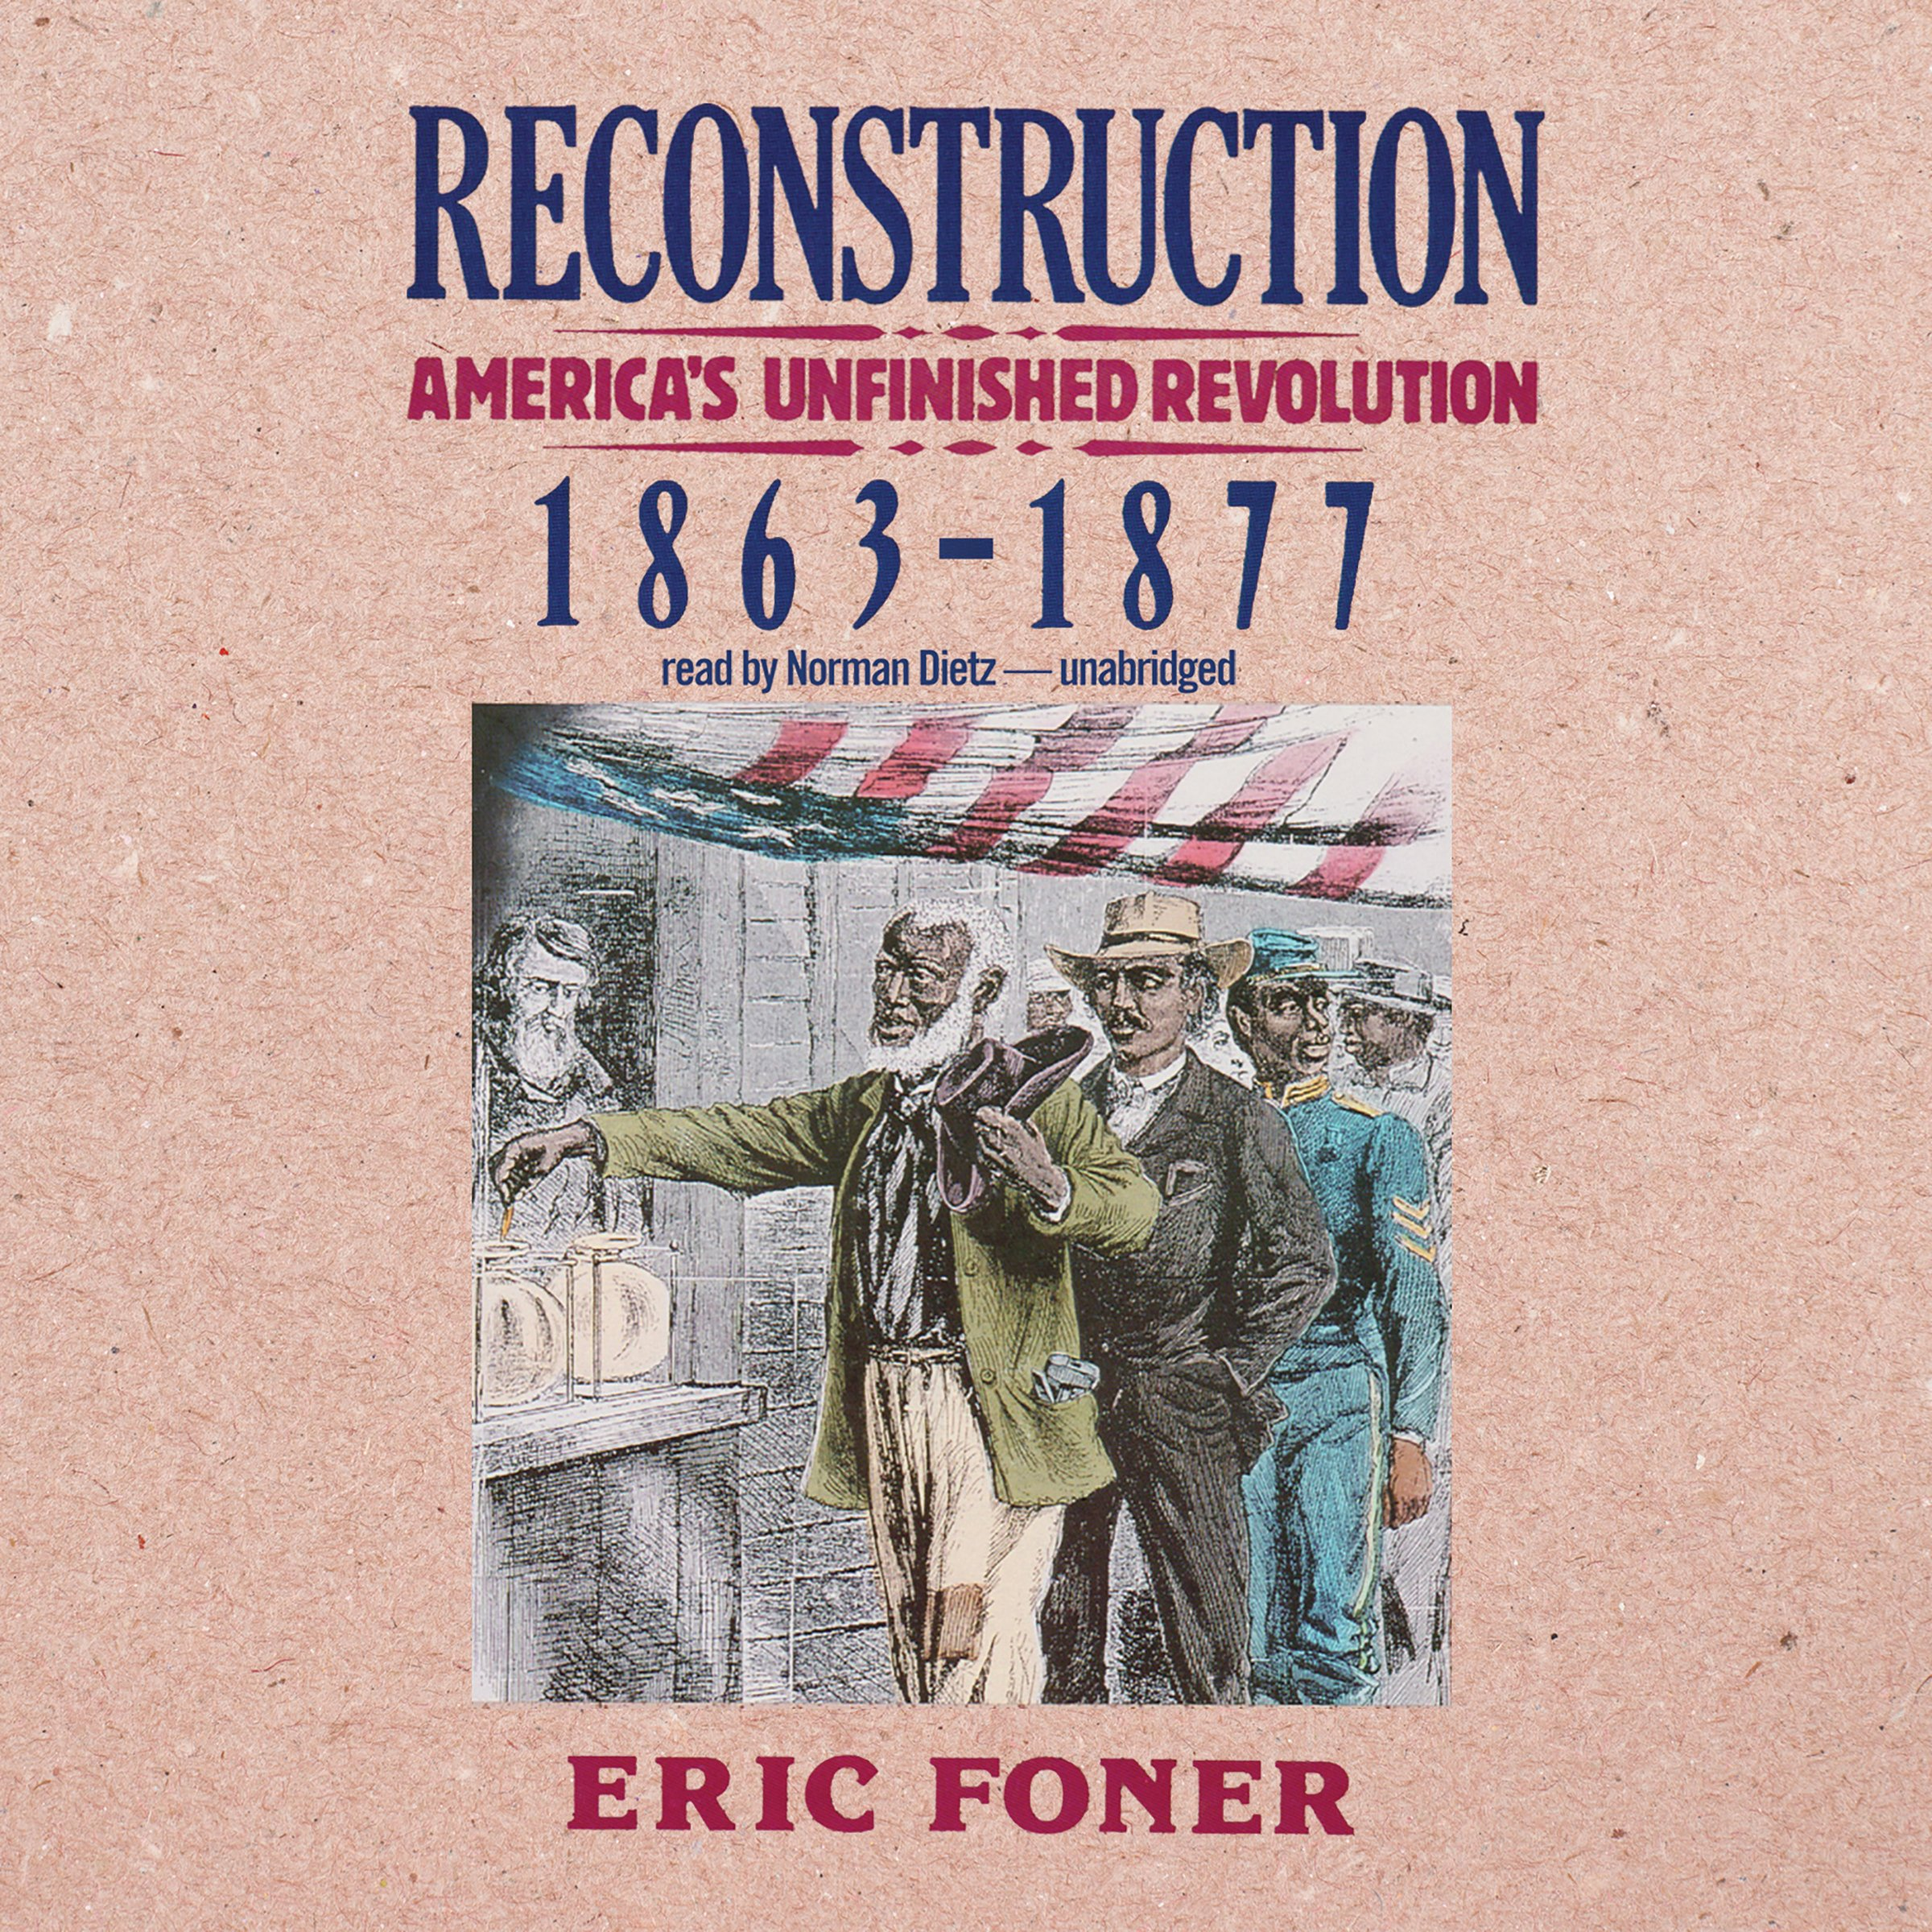 Image result for eric foner reconstruction